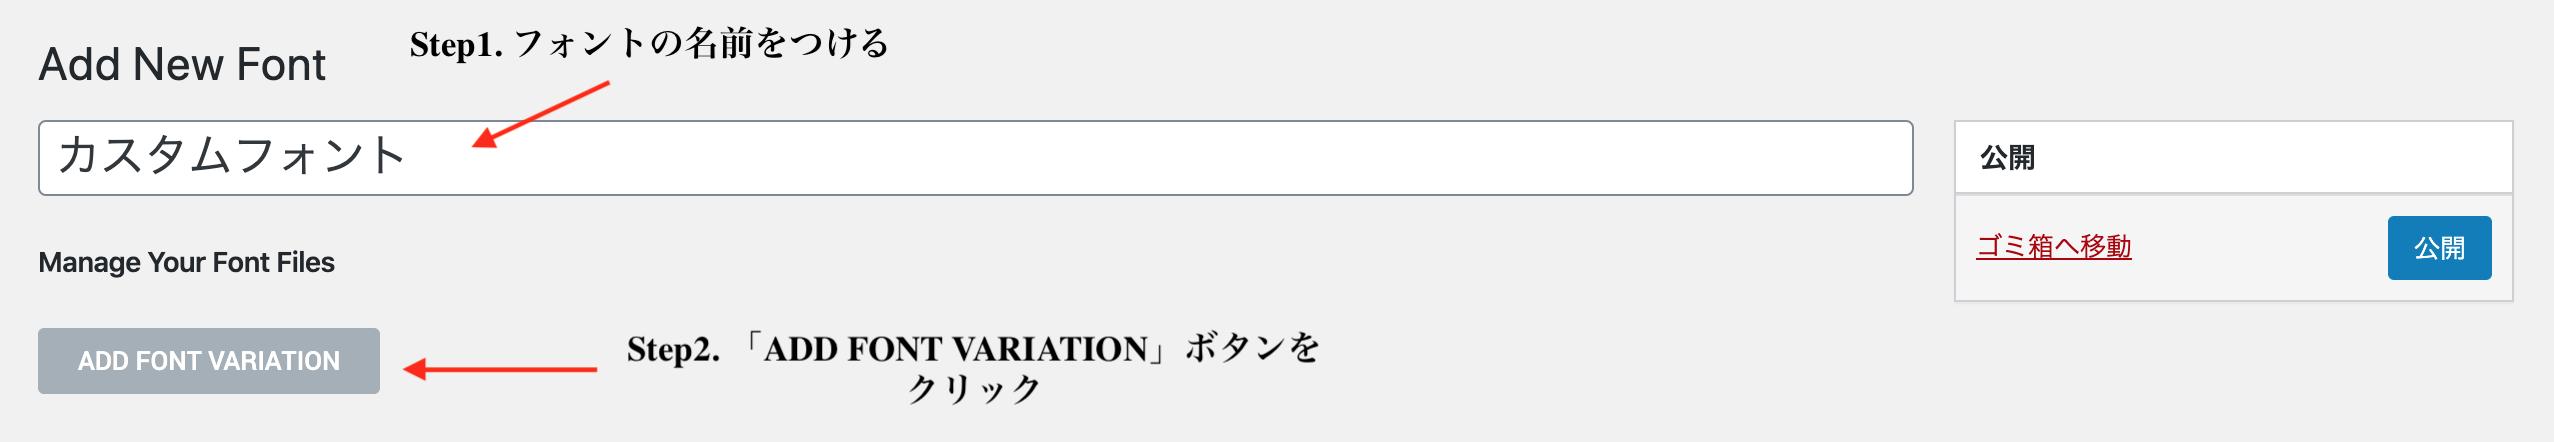 Elementor カスタムフォント 名前を入力し「ADD FONT VARIATION」